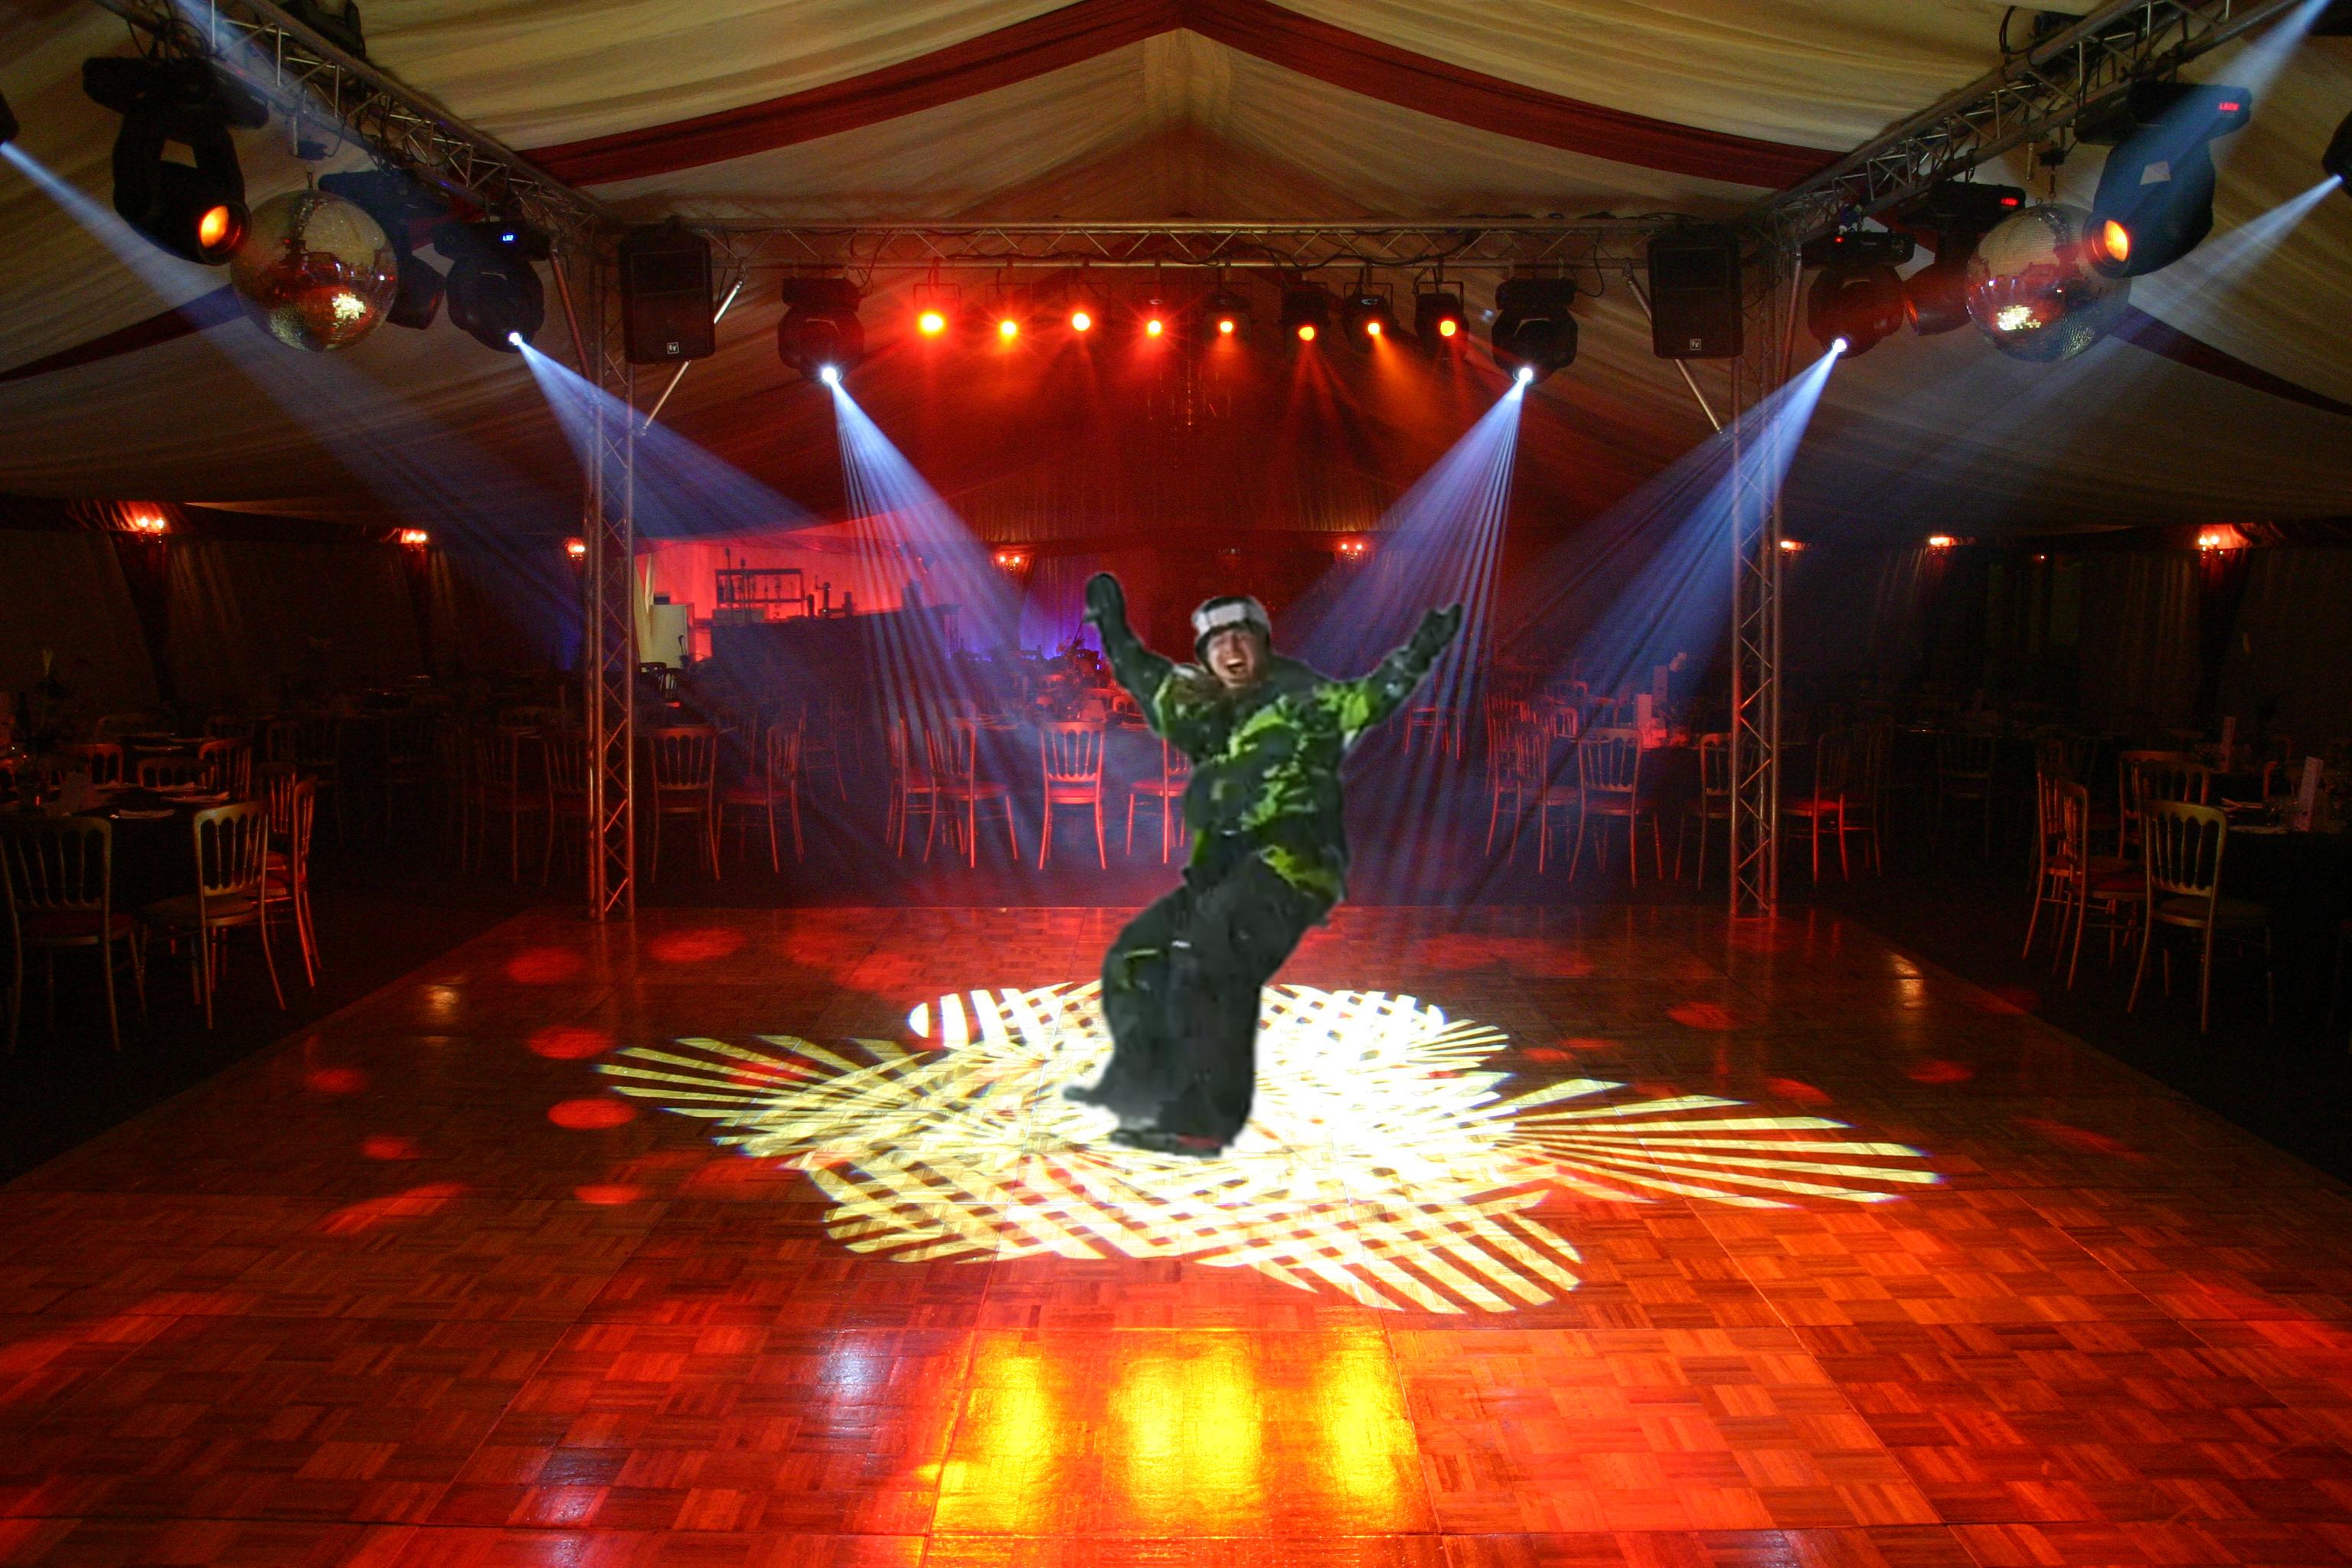 nightclub dance floor lighting